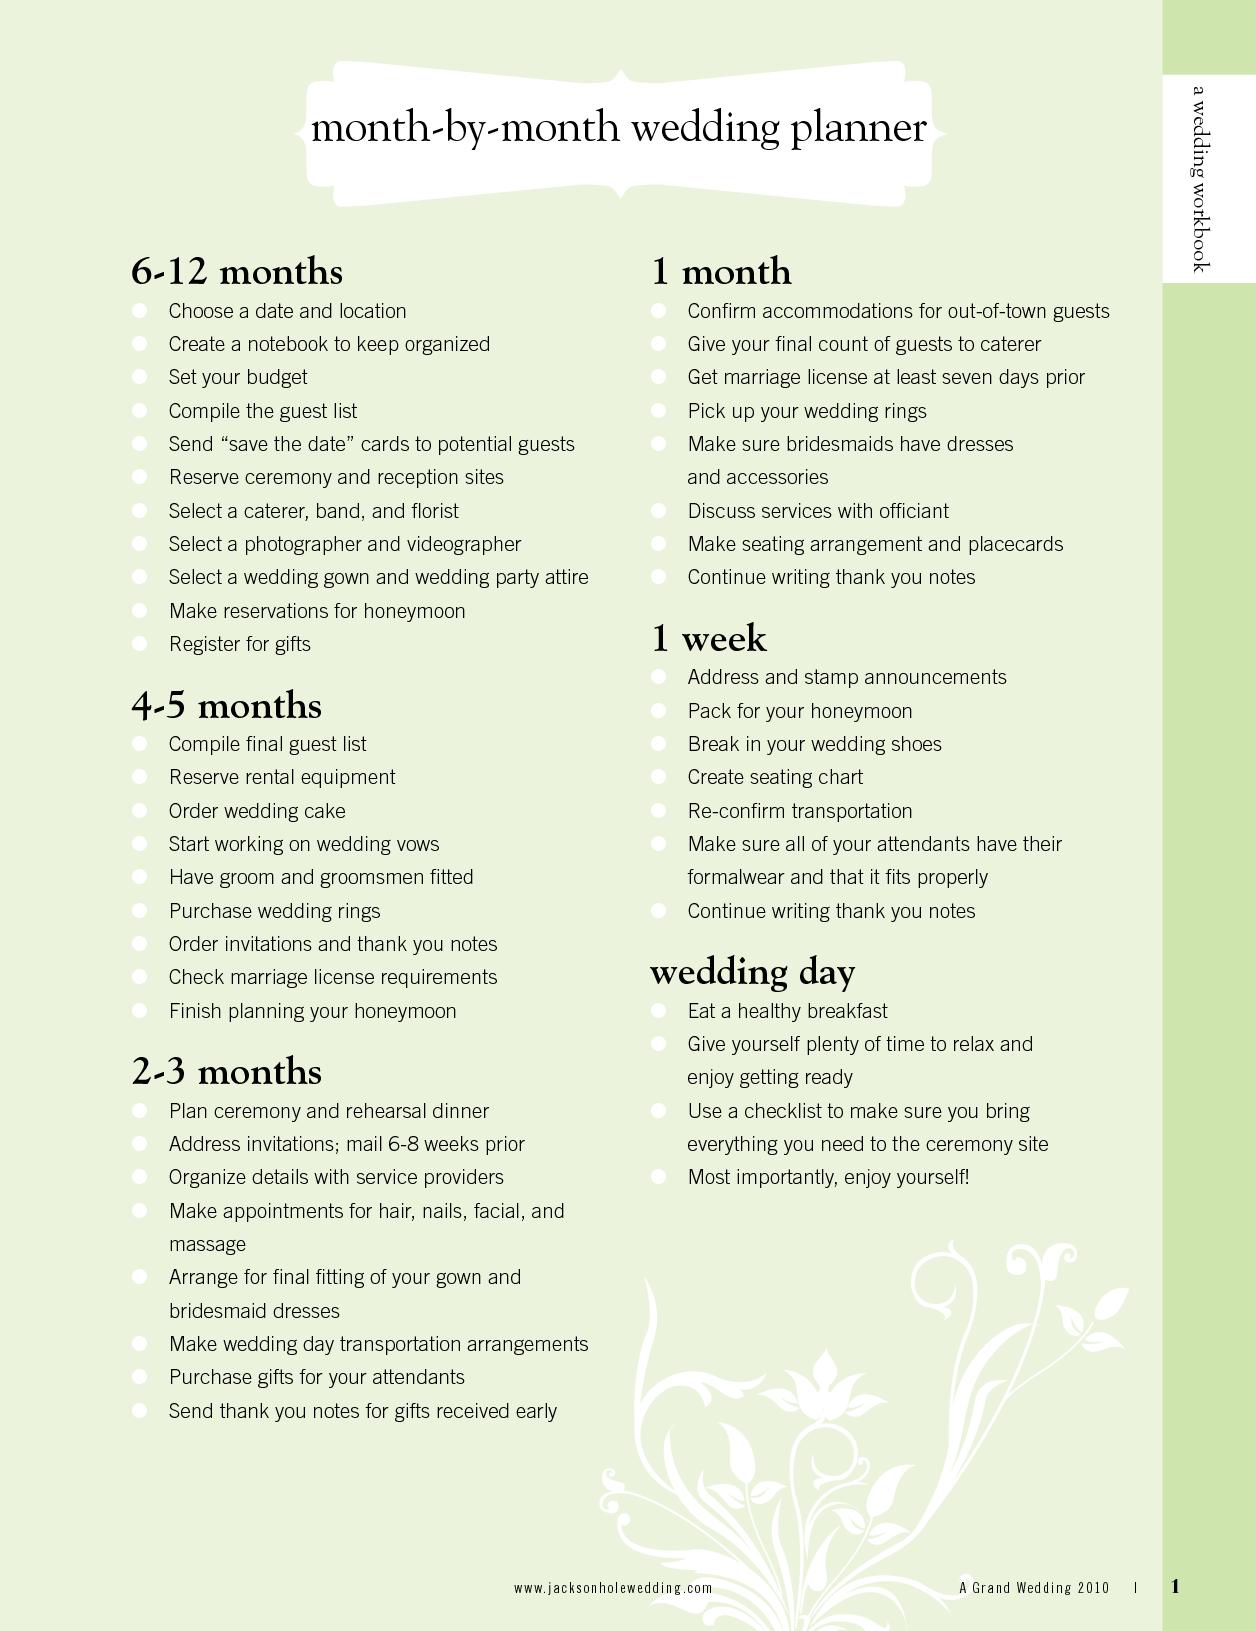 6 month wedding timeline